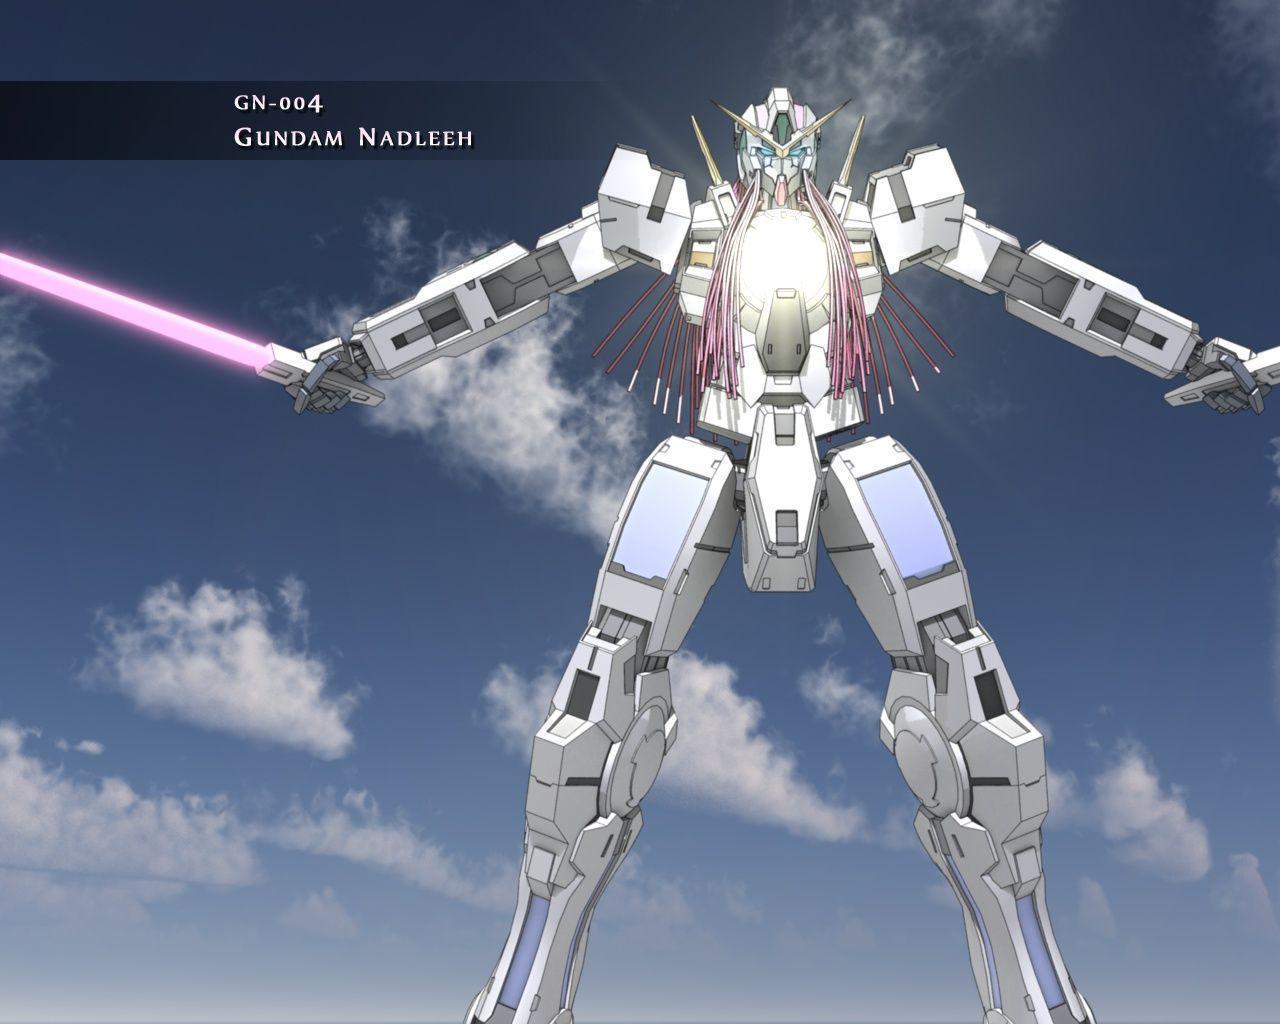 Gundam 00 Wallpapers - Wallpaper Cave